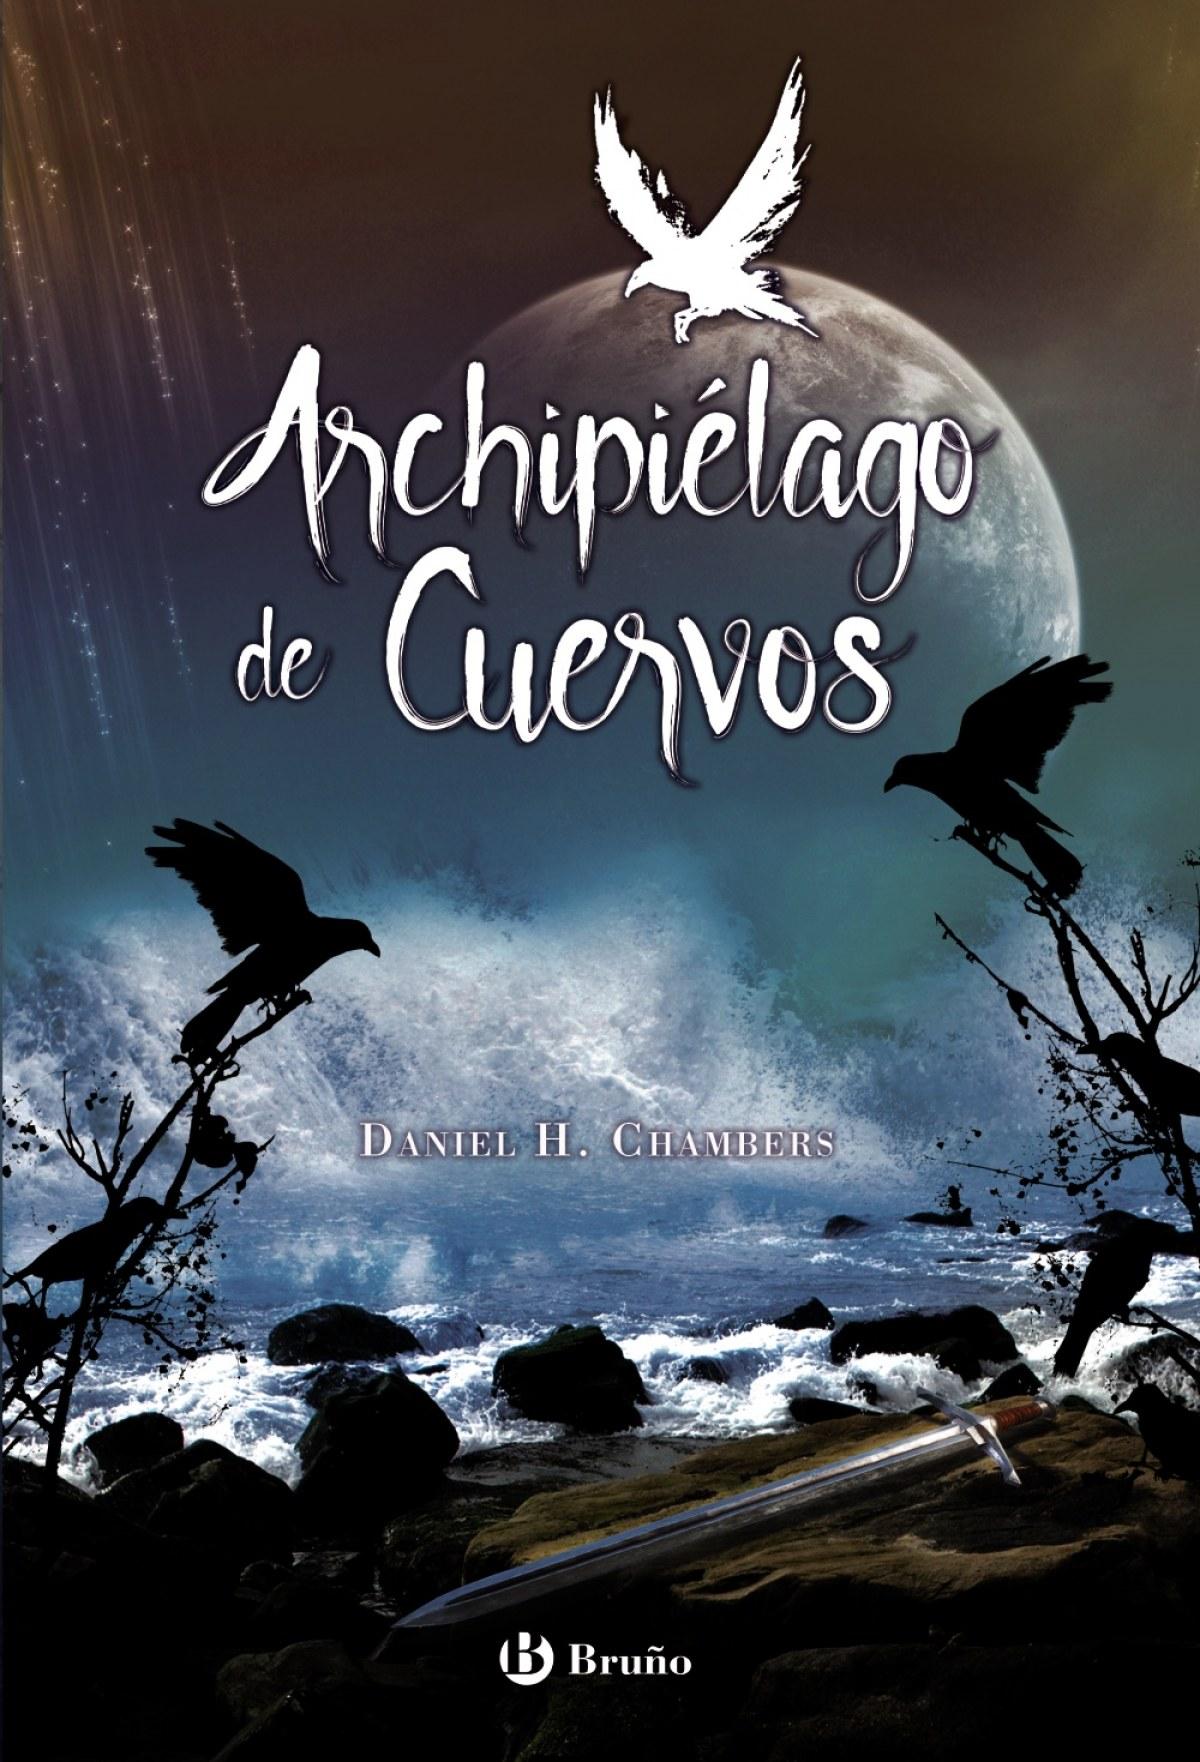 ARCHIPIÉLAGO DE CUERVOS 9788469621417